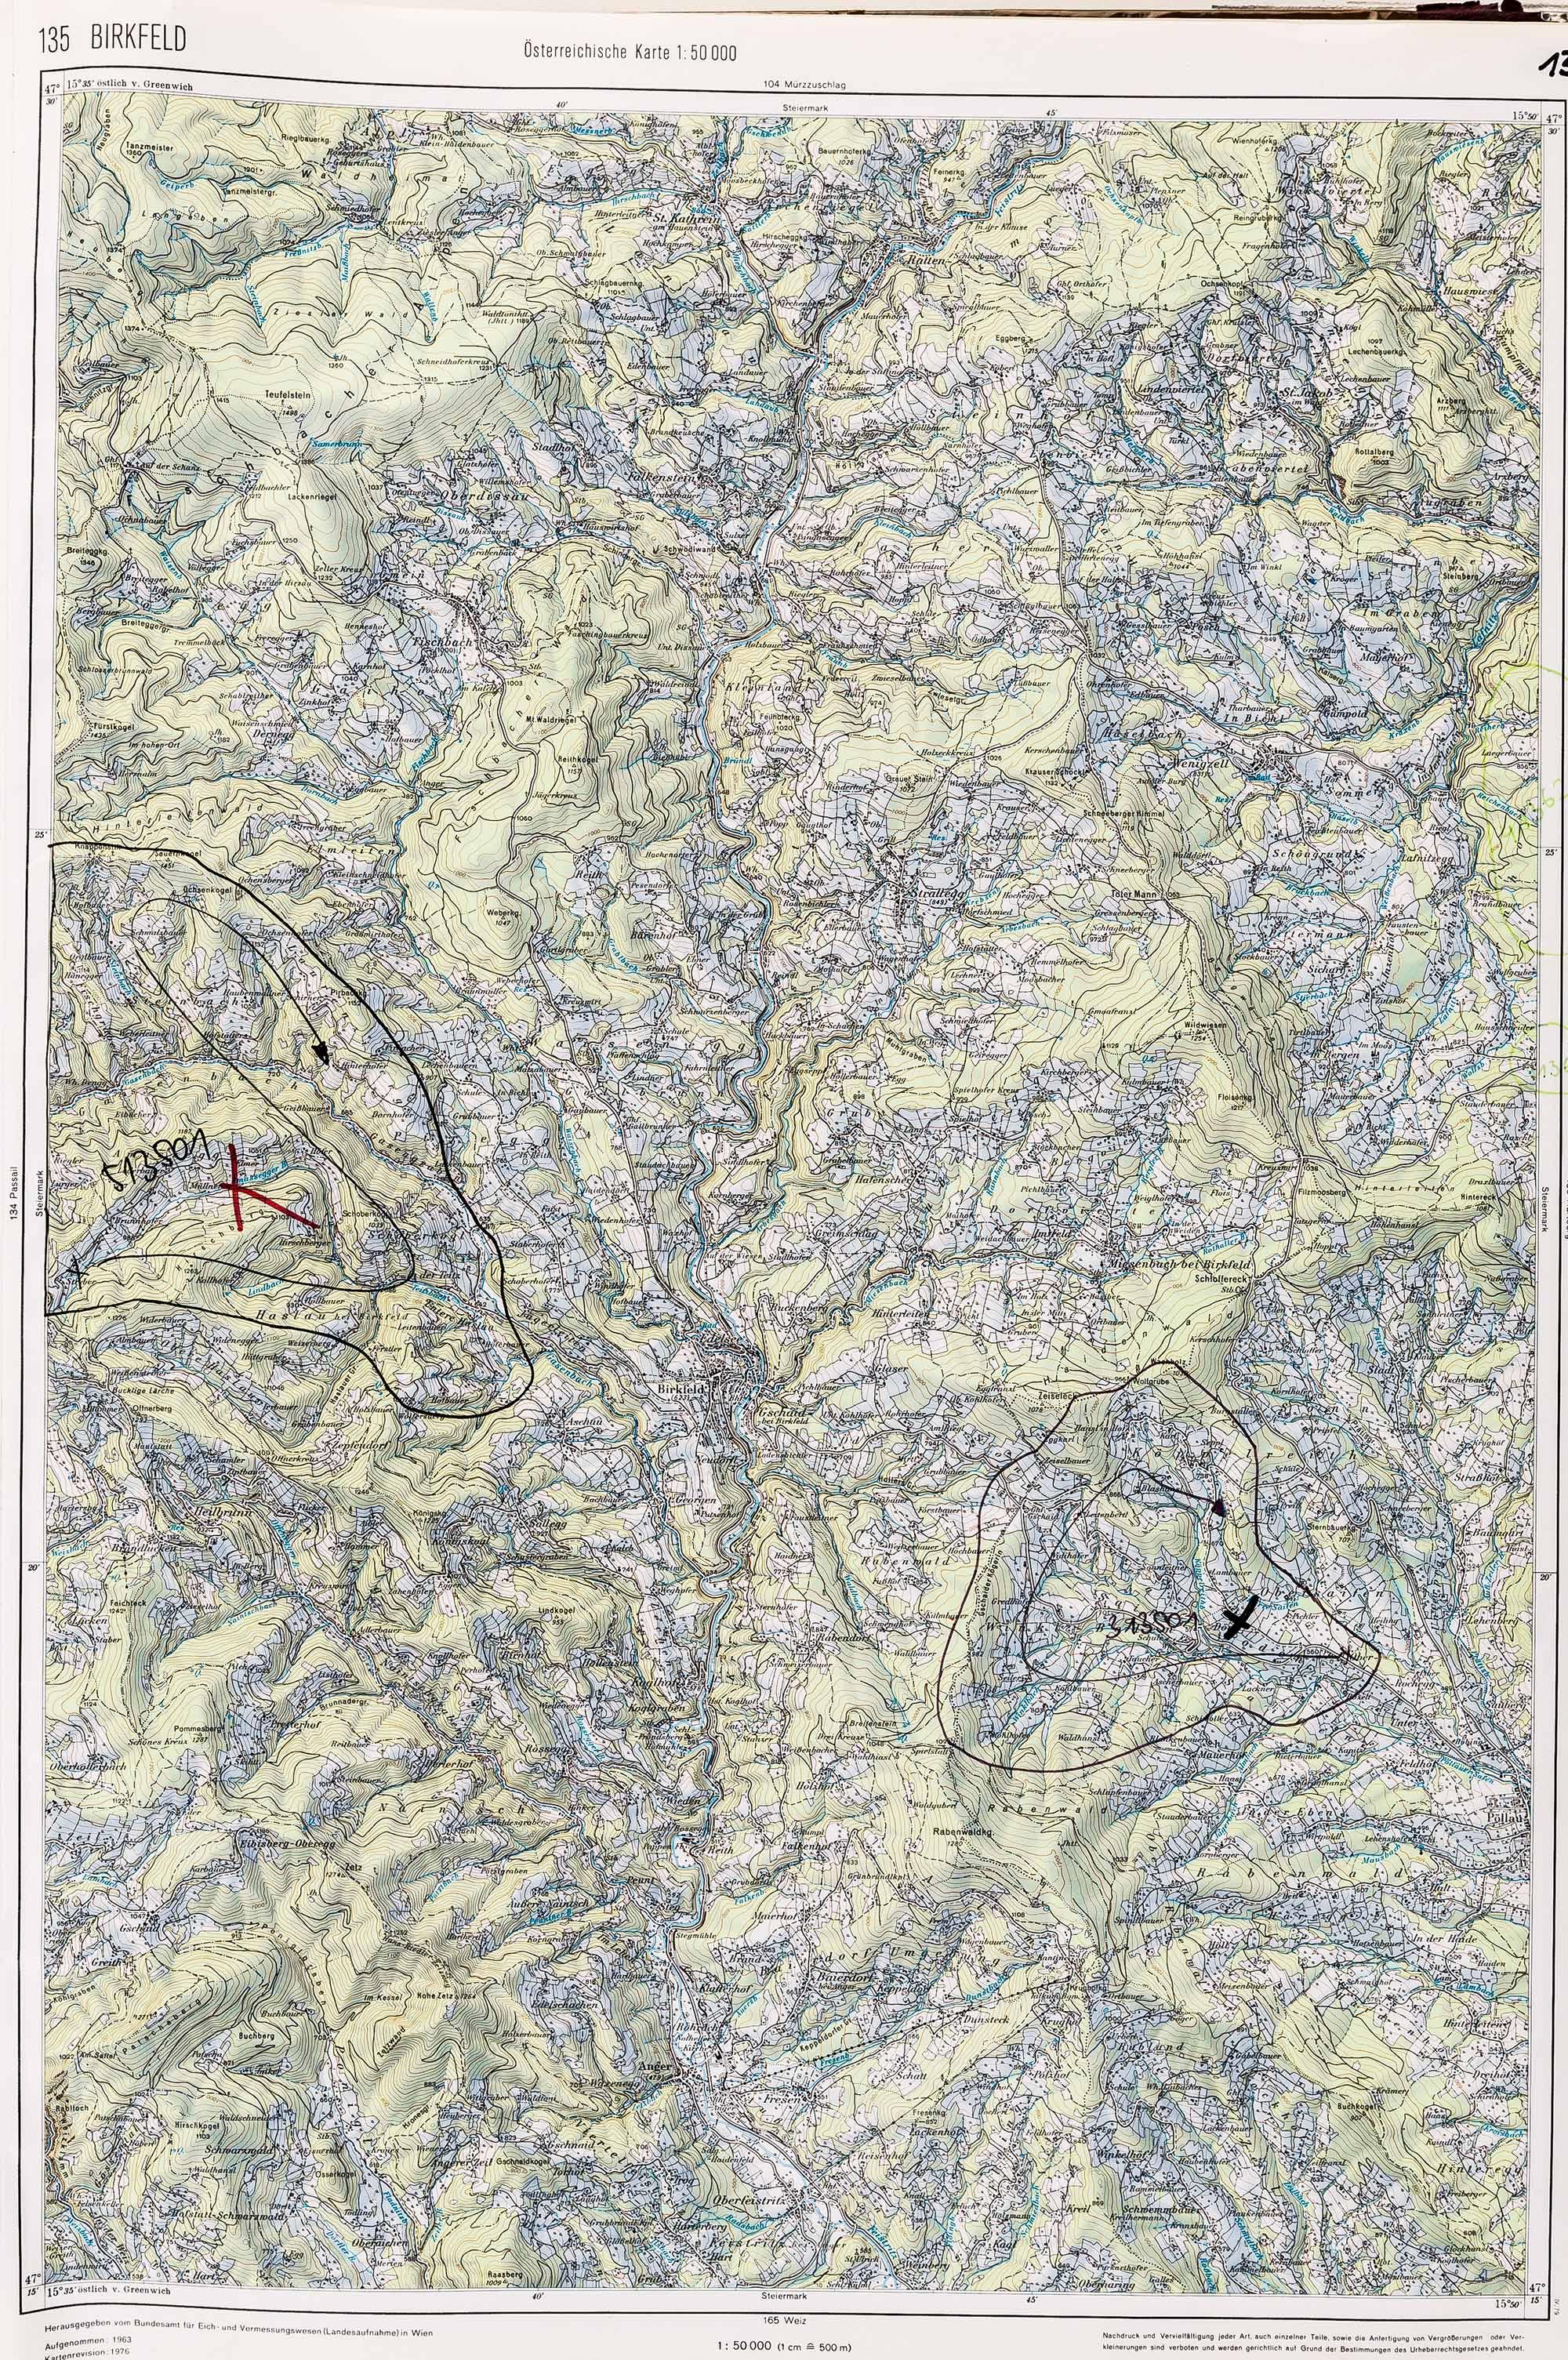 1983-1986 Karte 135